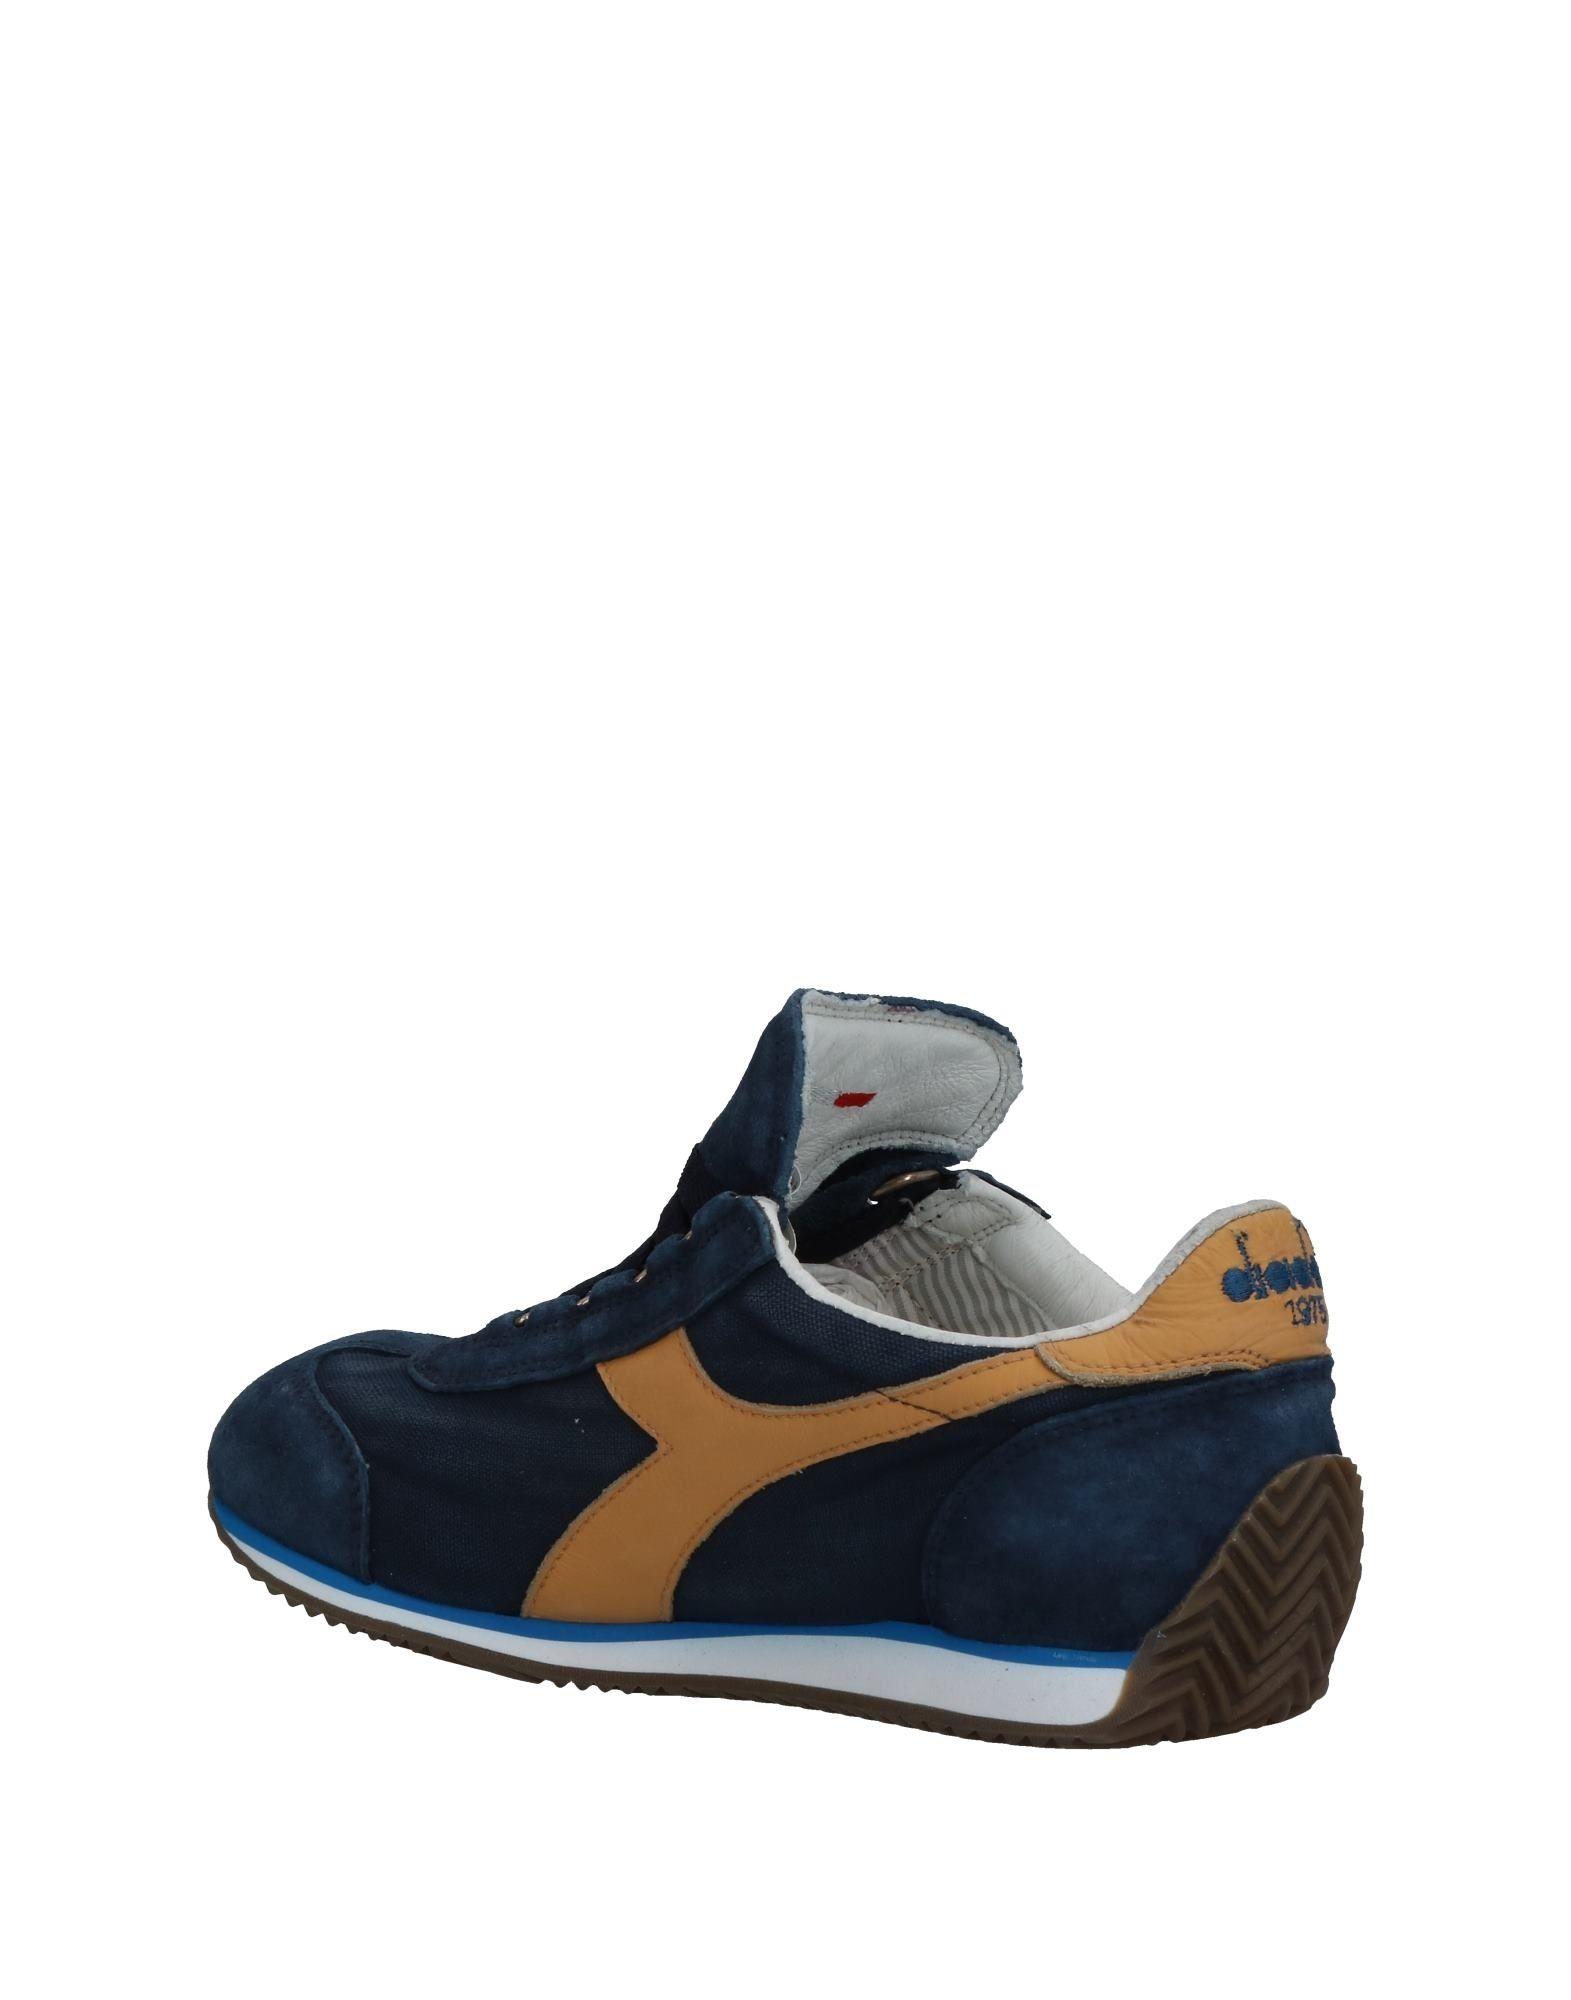 Diadora Heritage Sneakers Damen  11343476TR Gute Qualität beliebte Schuhe